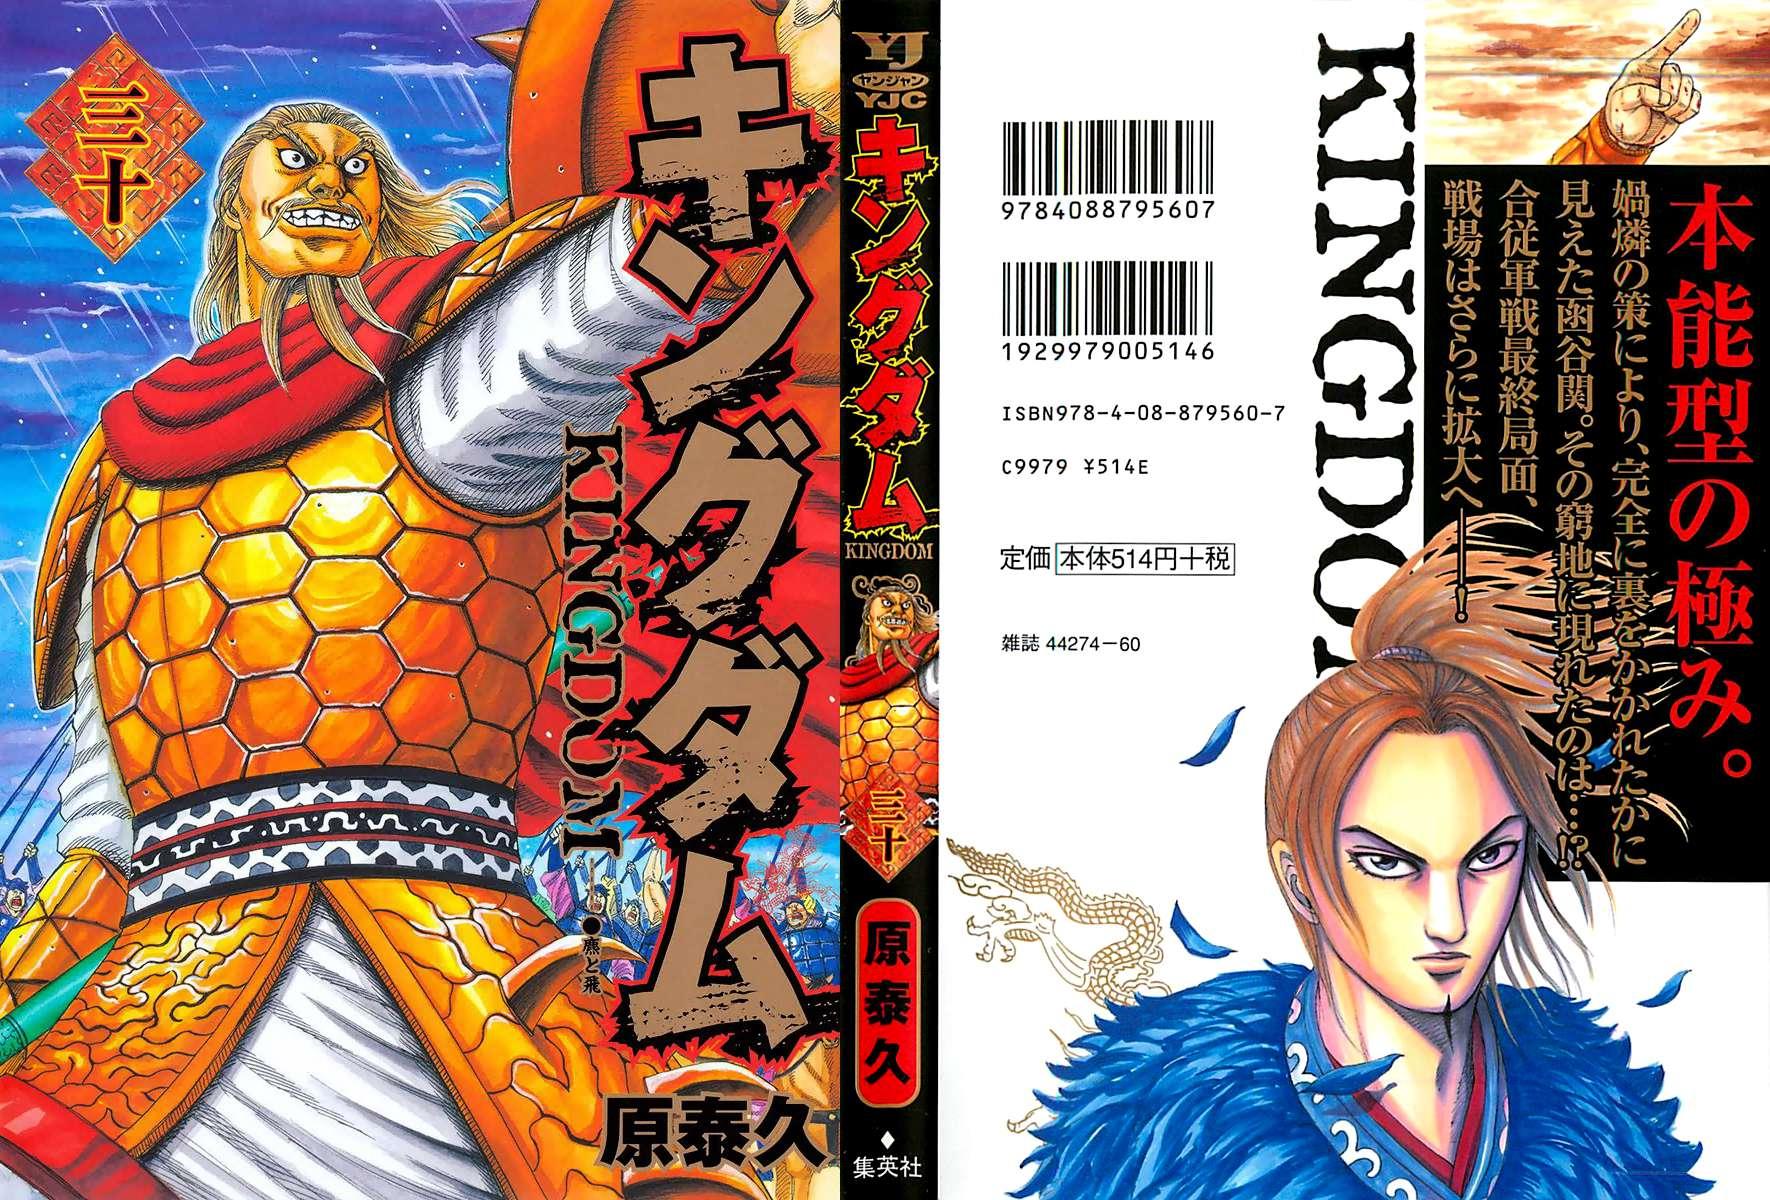 http://c5.ninemanga.com/es_manga/19/12307/360900/1fd4027460ea131cda5785309dc07220.jpg Page 2